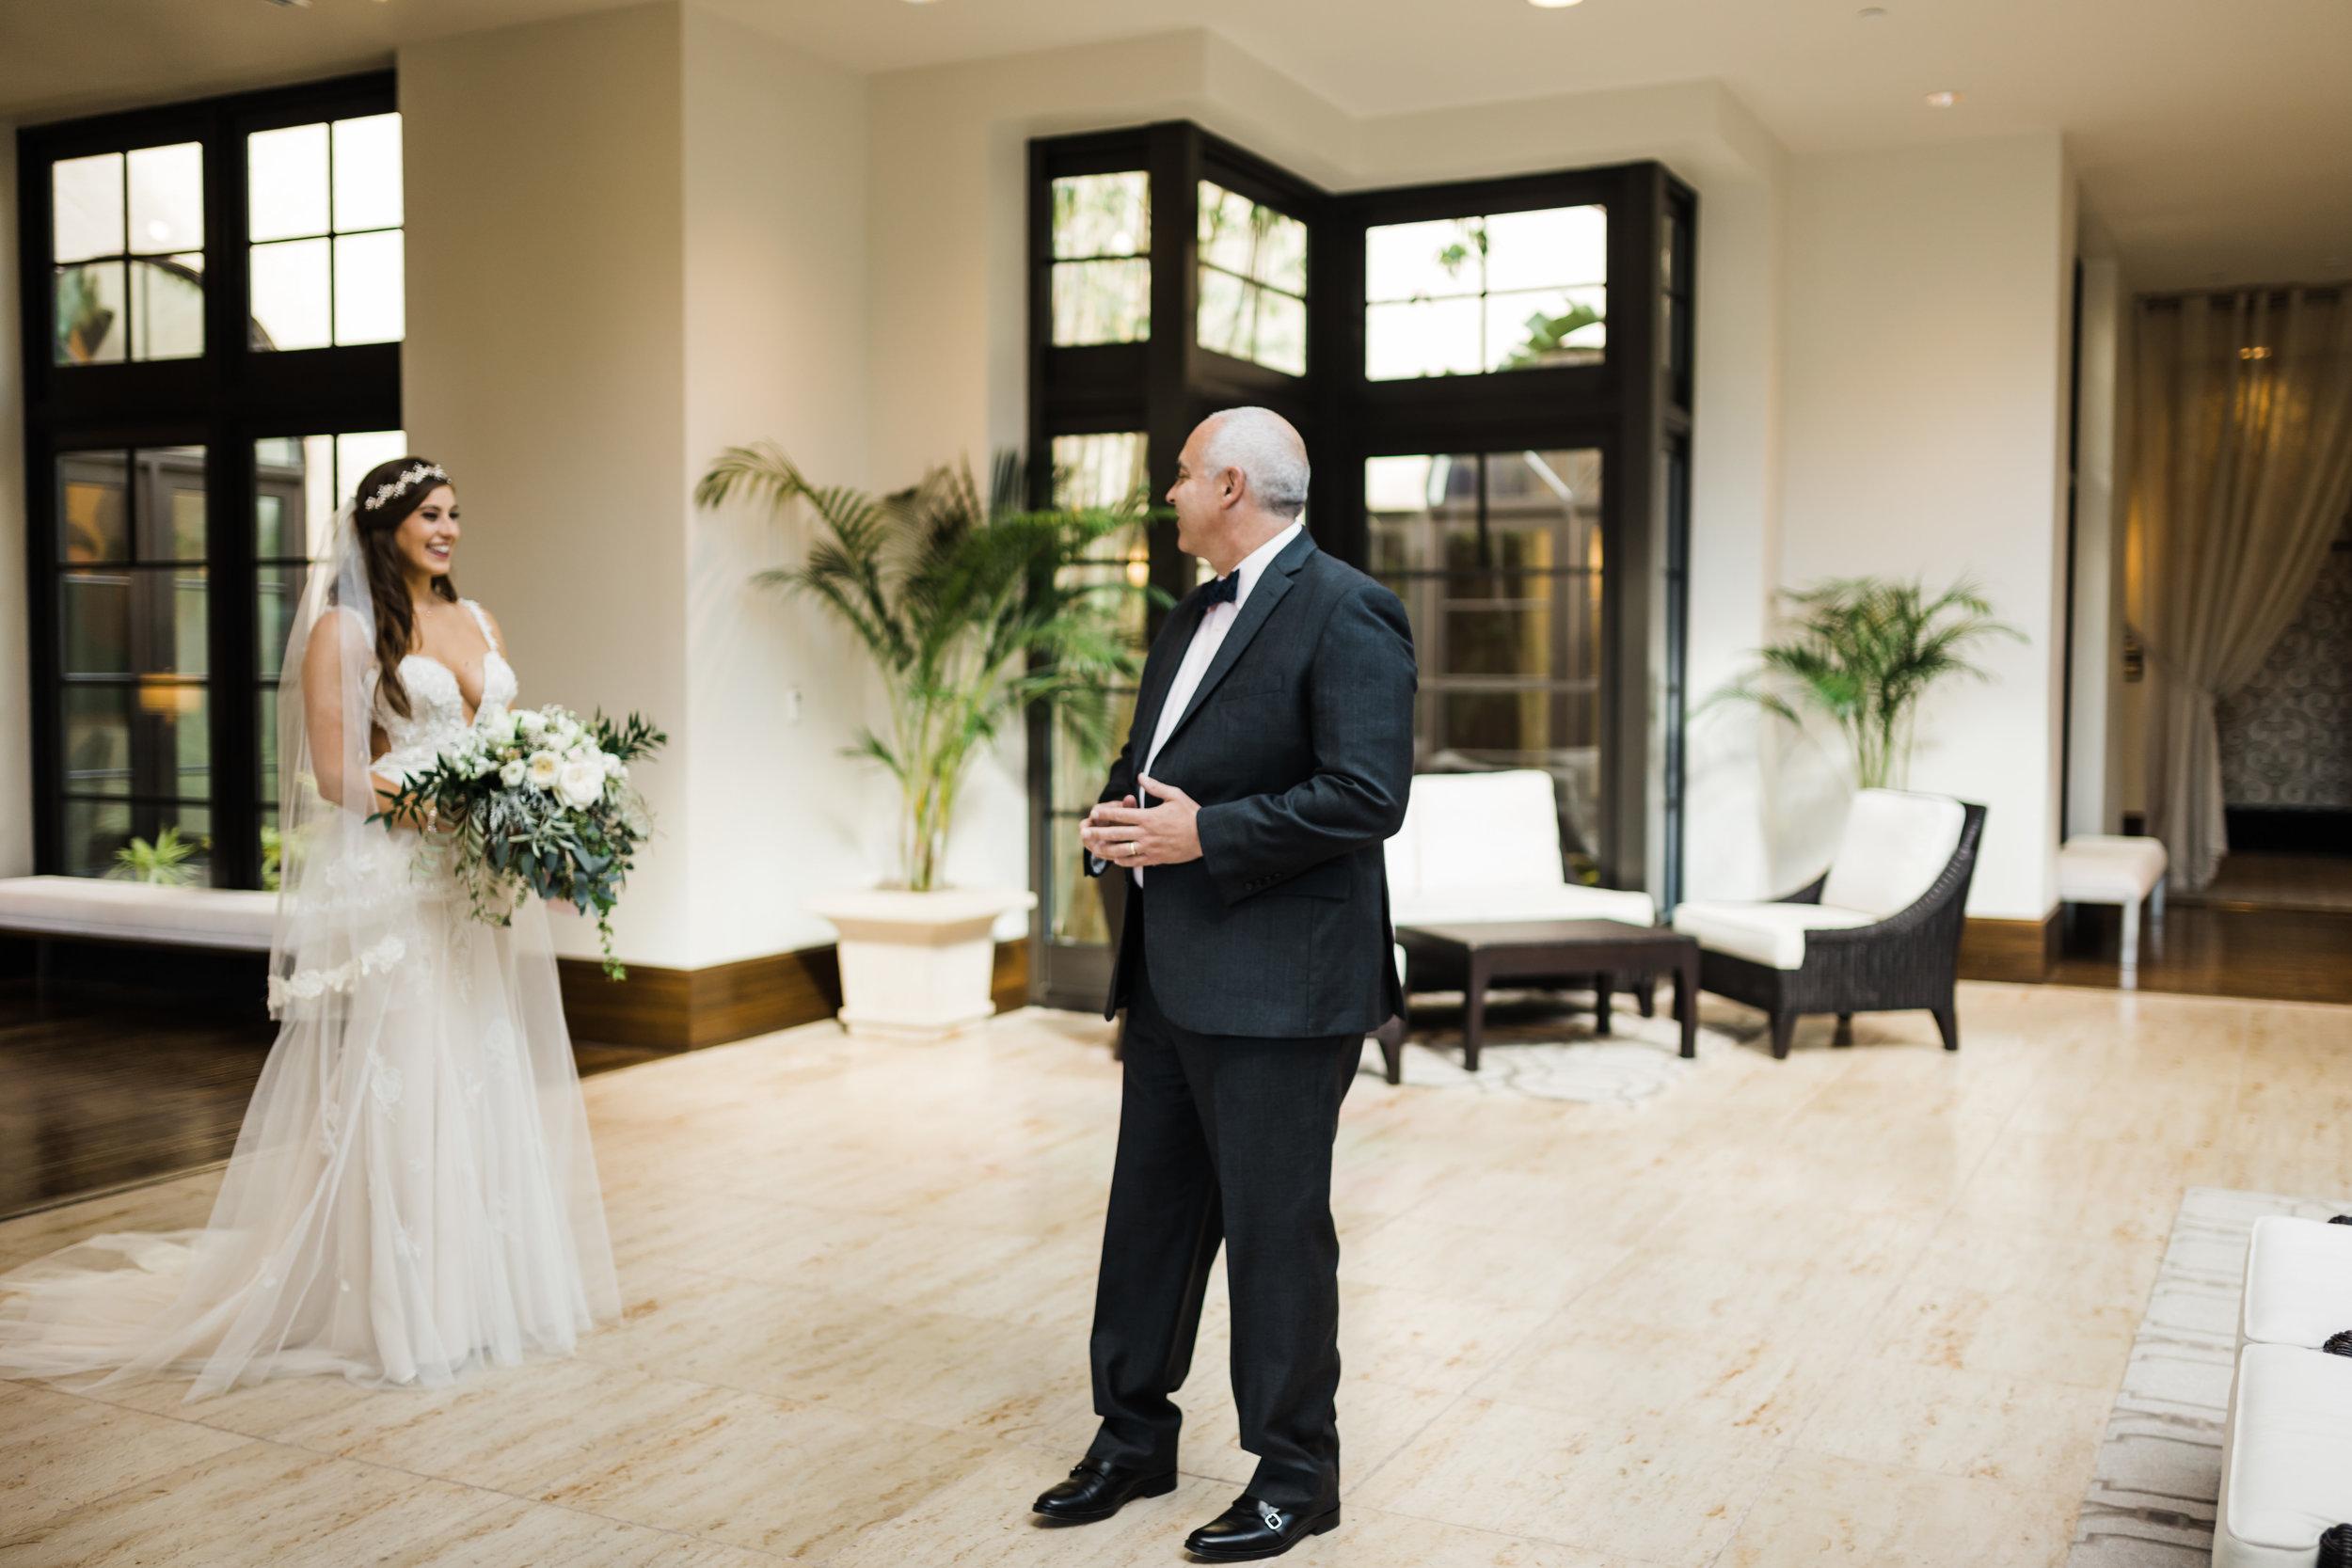 2017.10.15 Steffi and Elliott Simmonds Casa Feliz Wedding (185 of 969).jpg